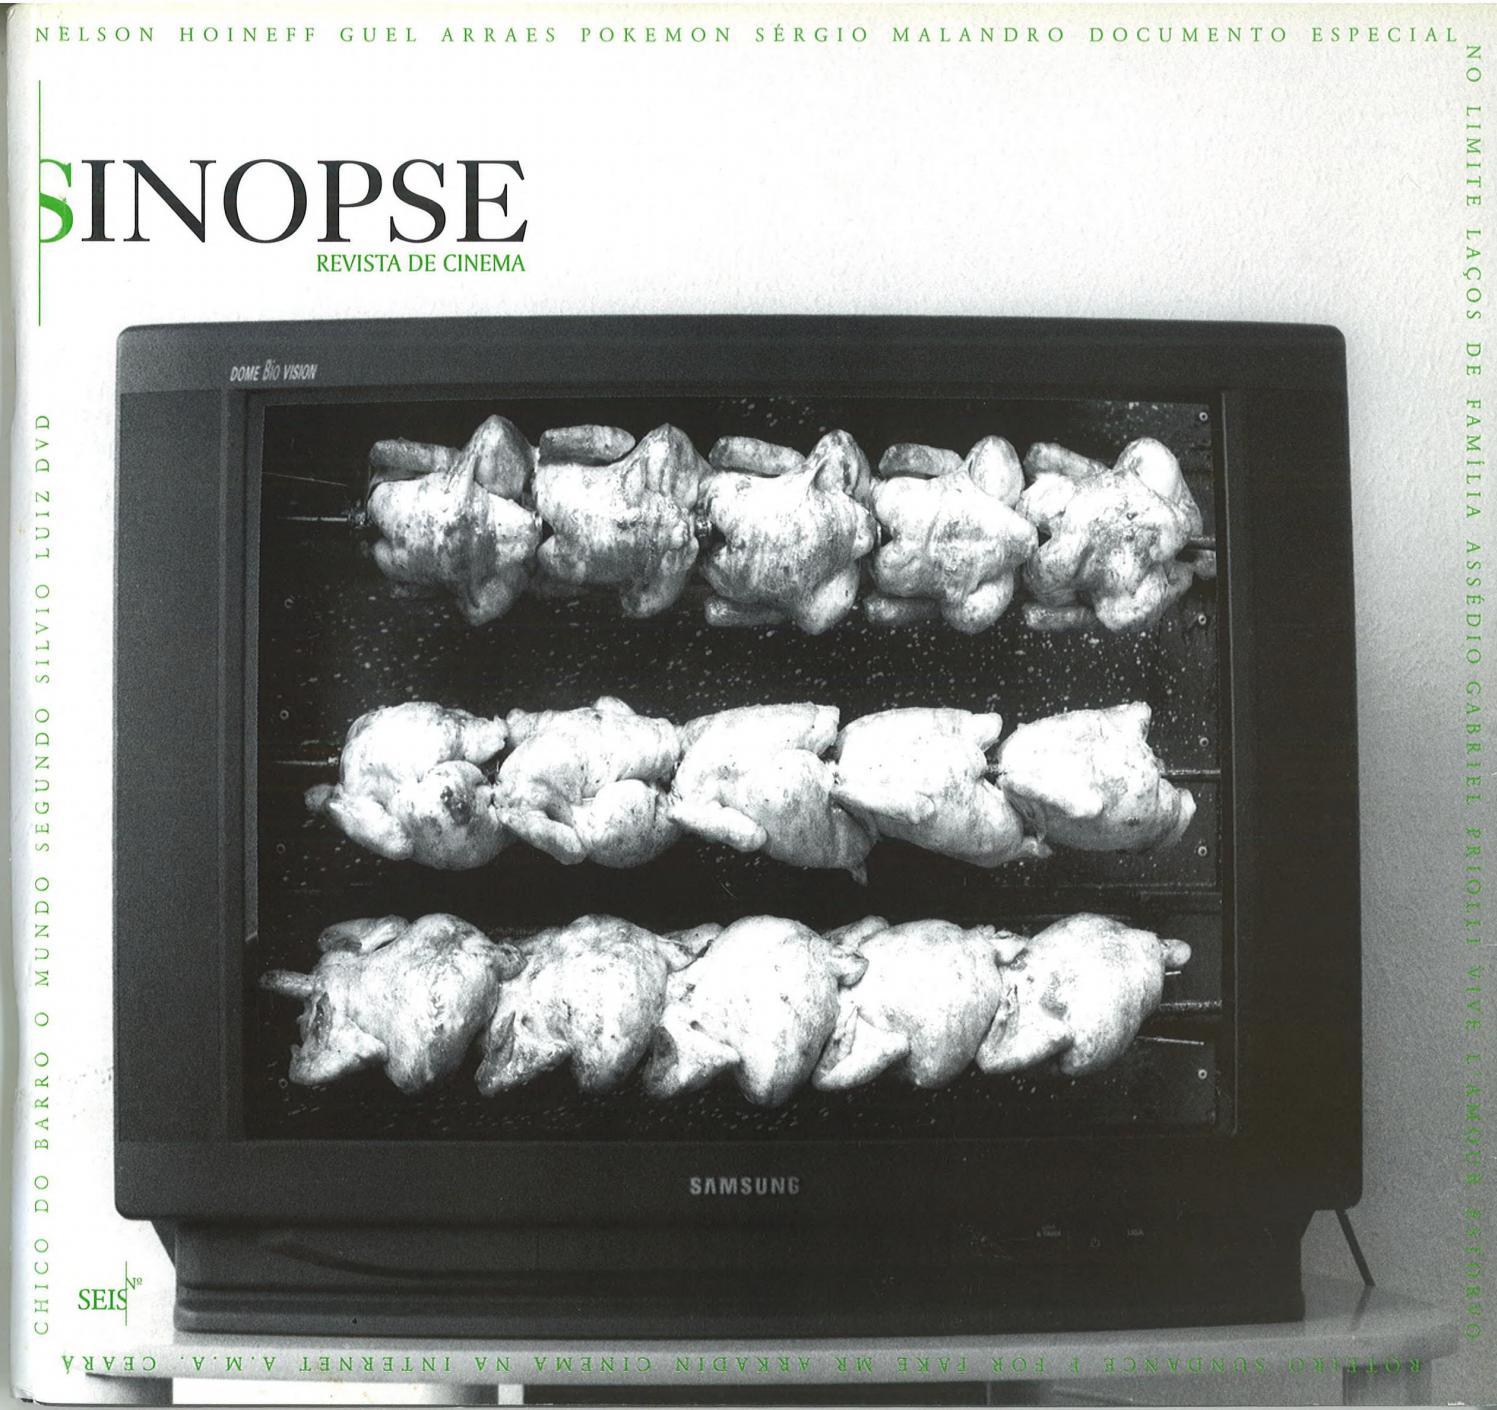 Sinopse 06 by CINUSP Paulo Emílio - issuu 2b59d689621